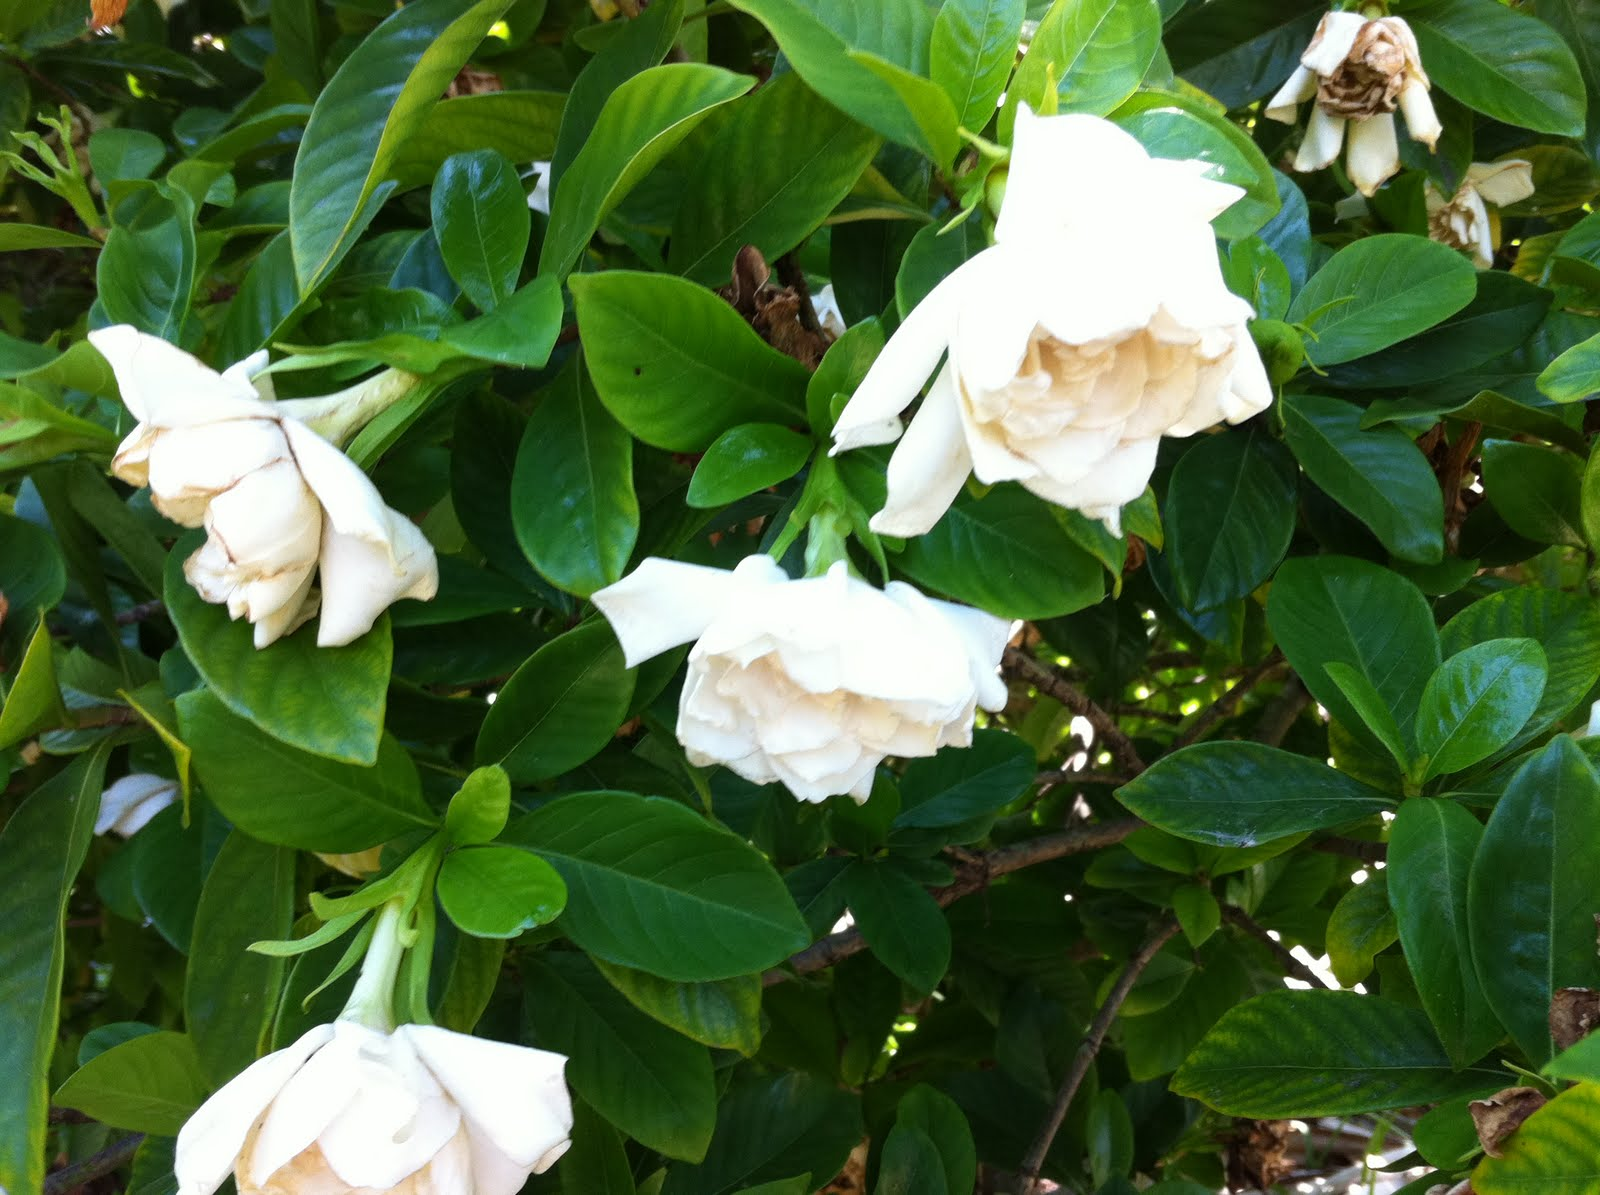 Seores de Gardenia Download Movie Pictures Photos Images